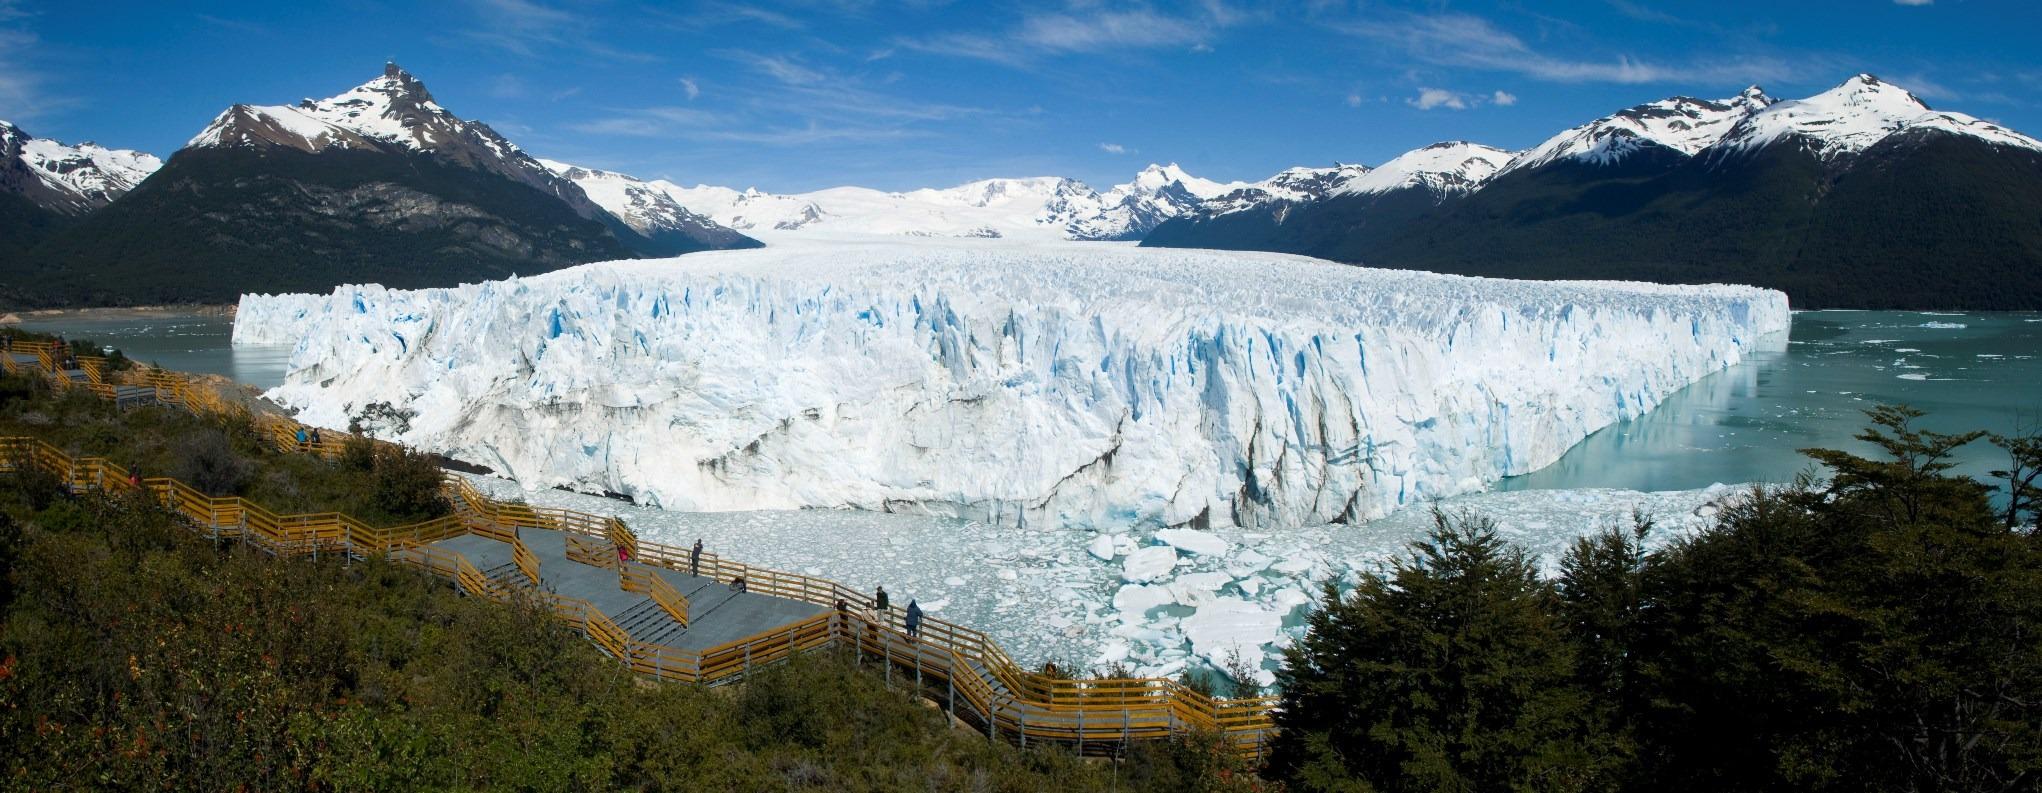 Experiencia Tolkeyen - Glaciar Perito Moreno